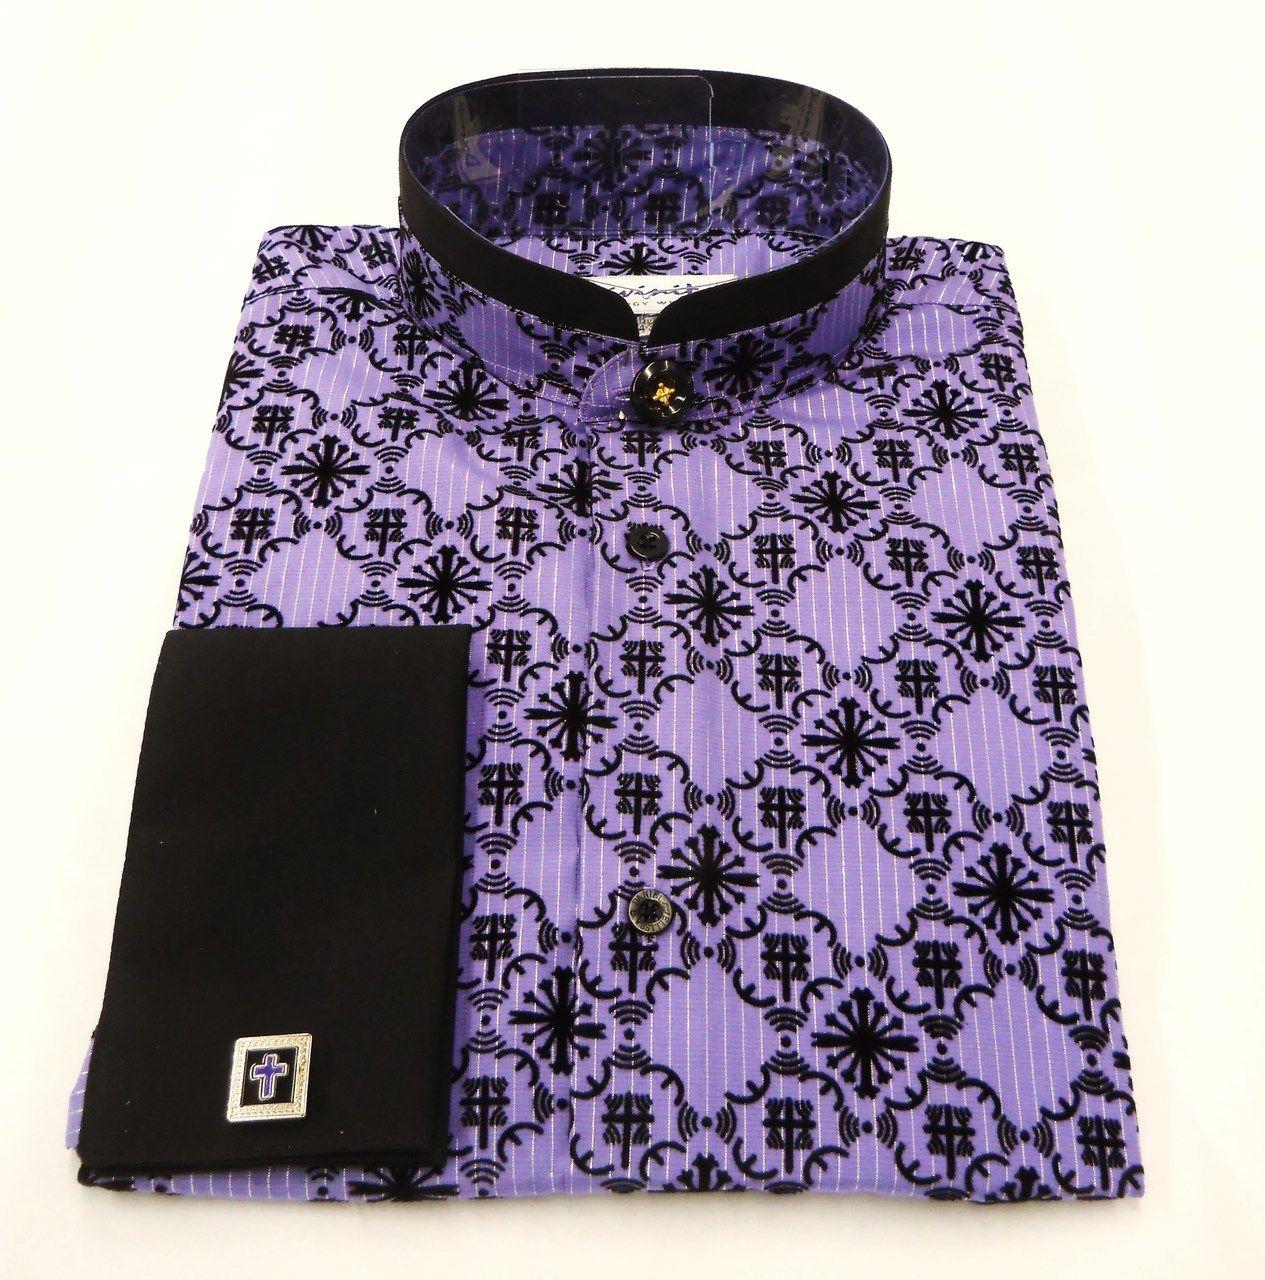 ddaf71ea6a Clergy Shirts And Collars Near Me - Joe Maloy